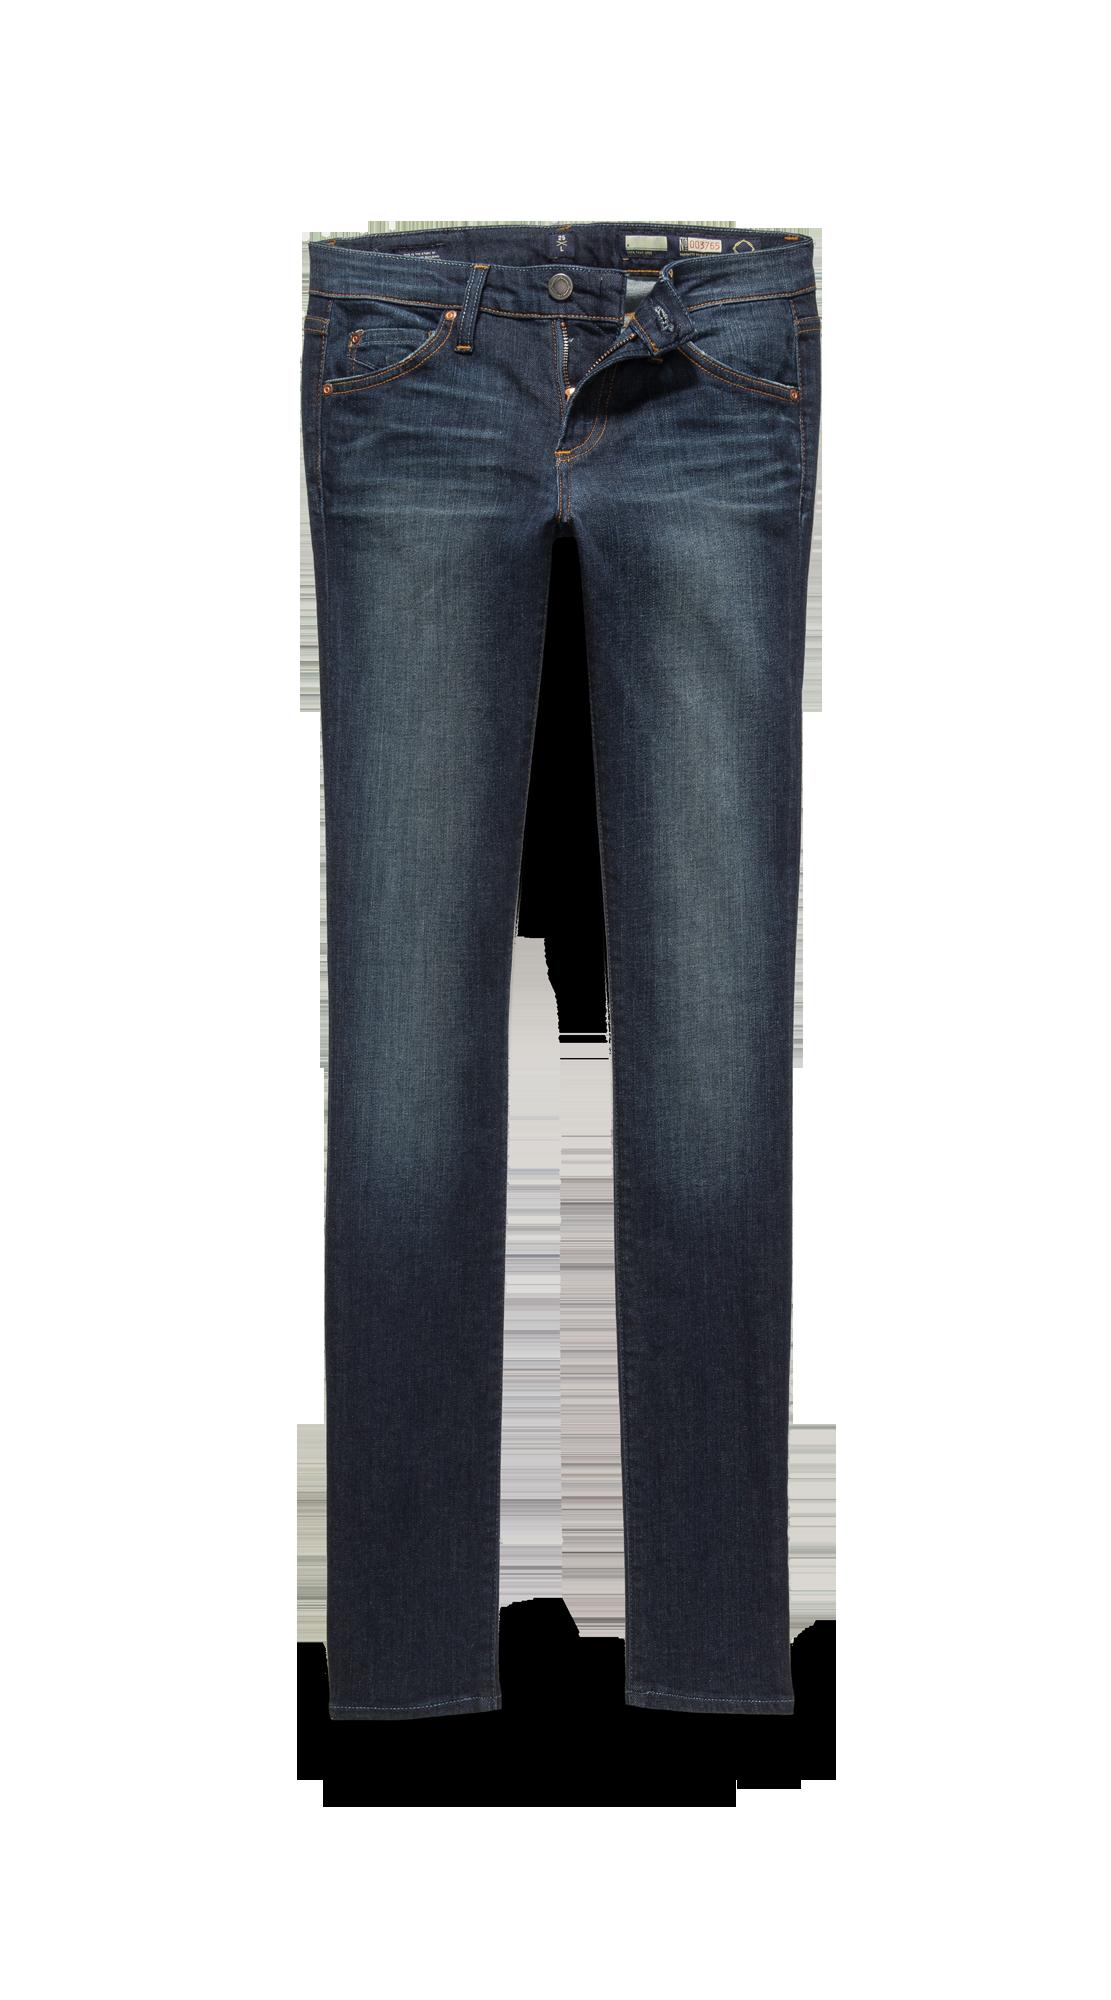 Slim Skinny Low Rise - Bluer Denim ... lovely company, great jeans.